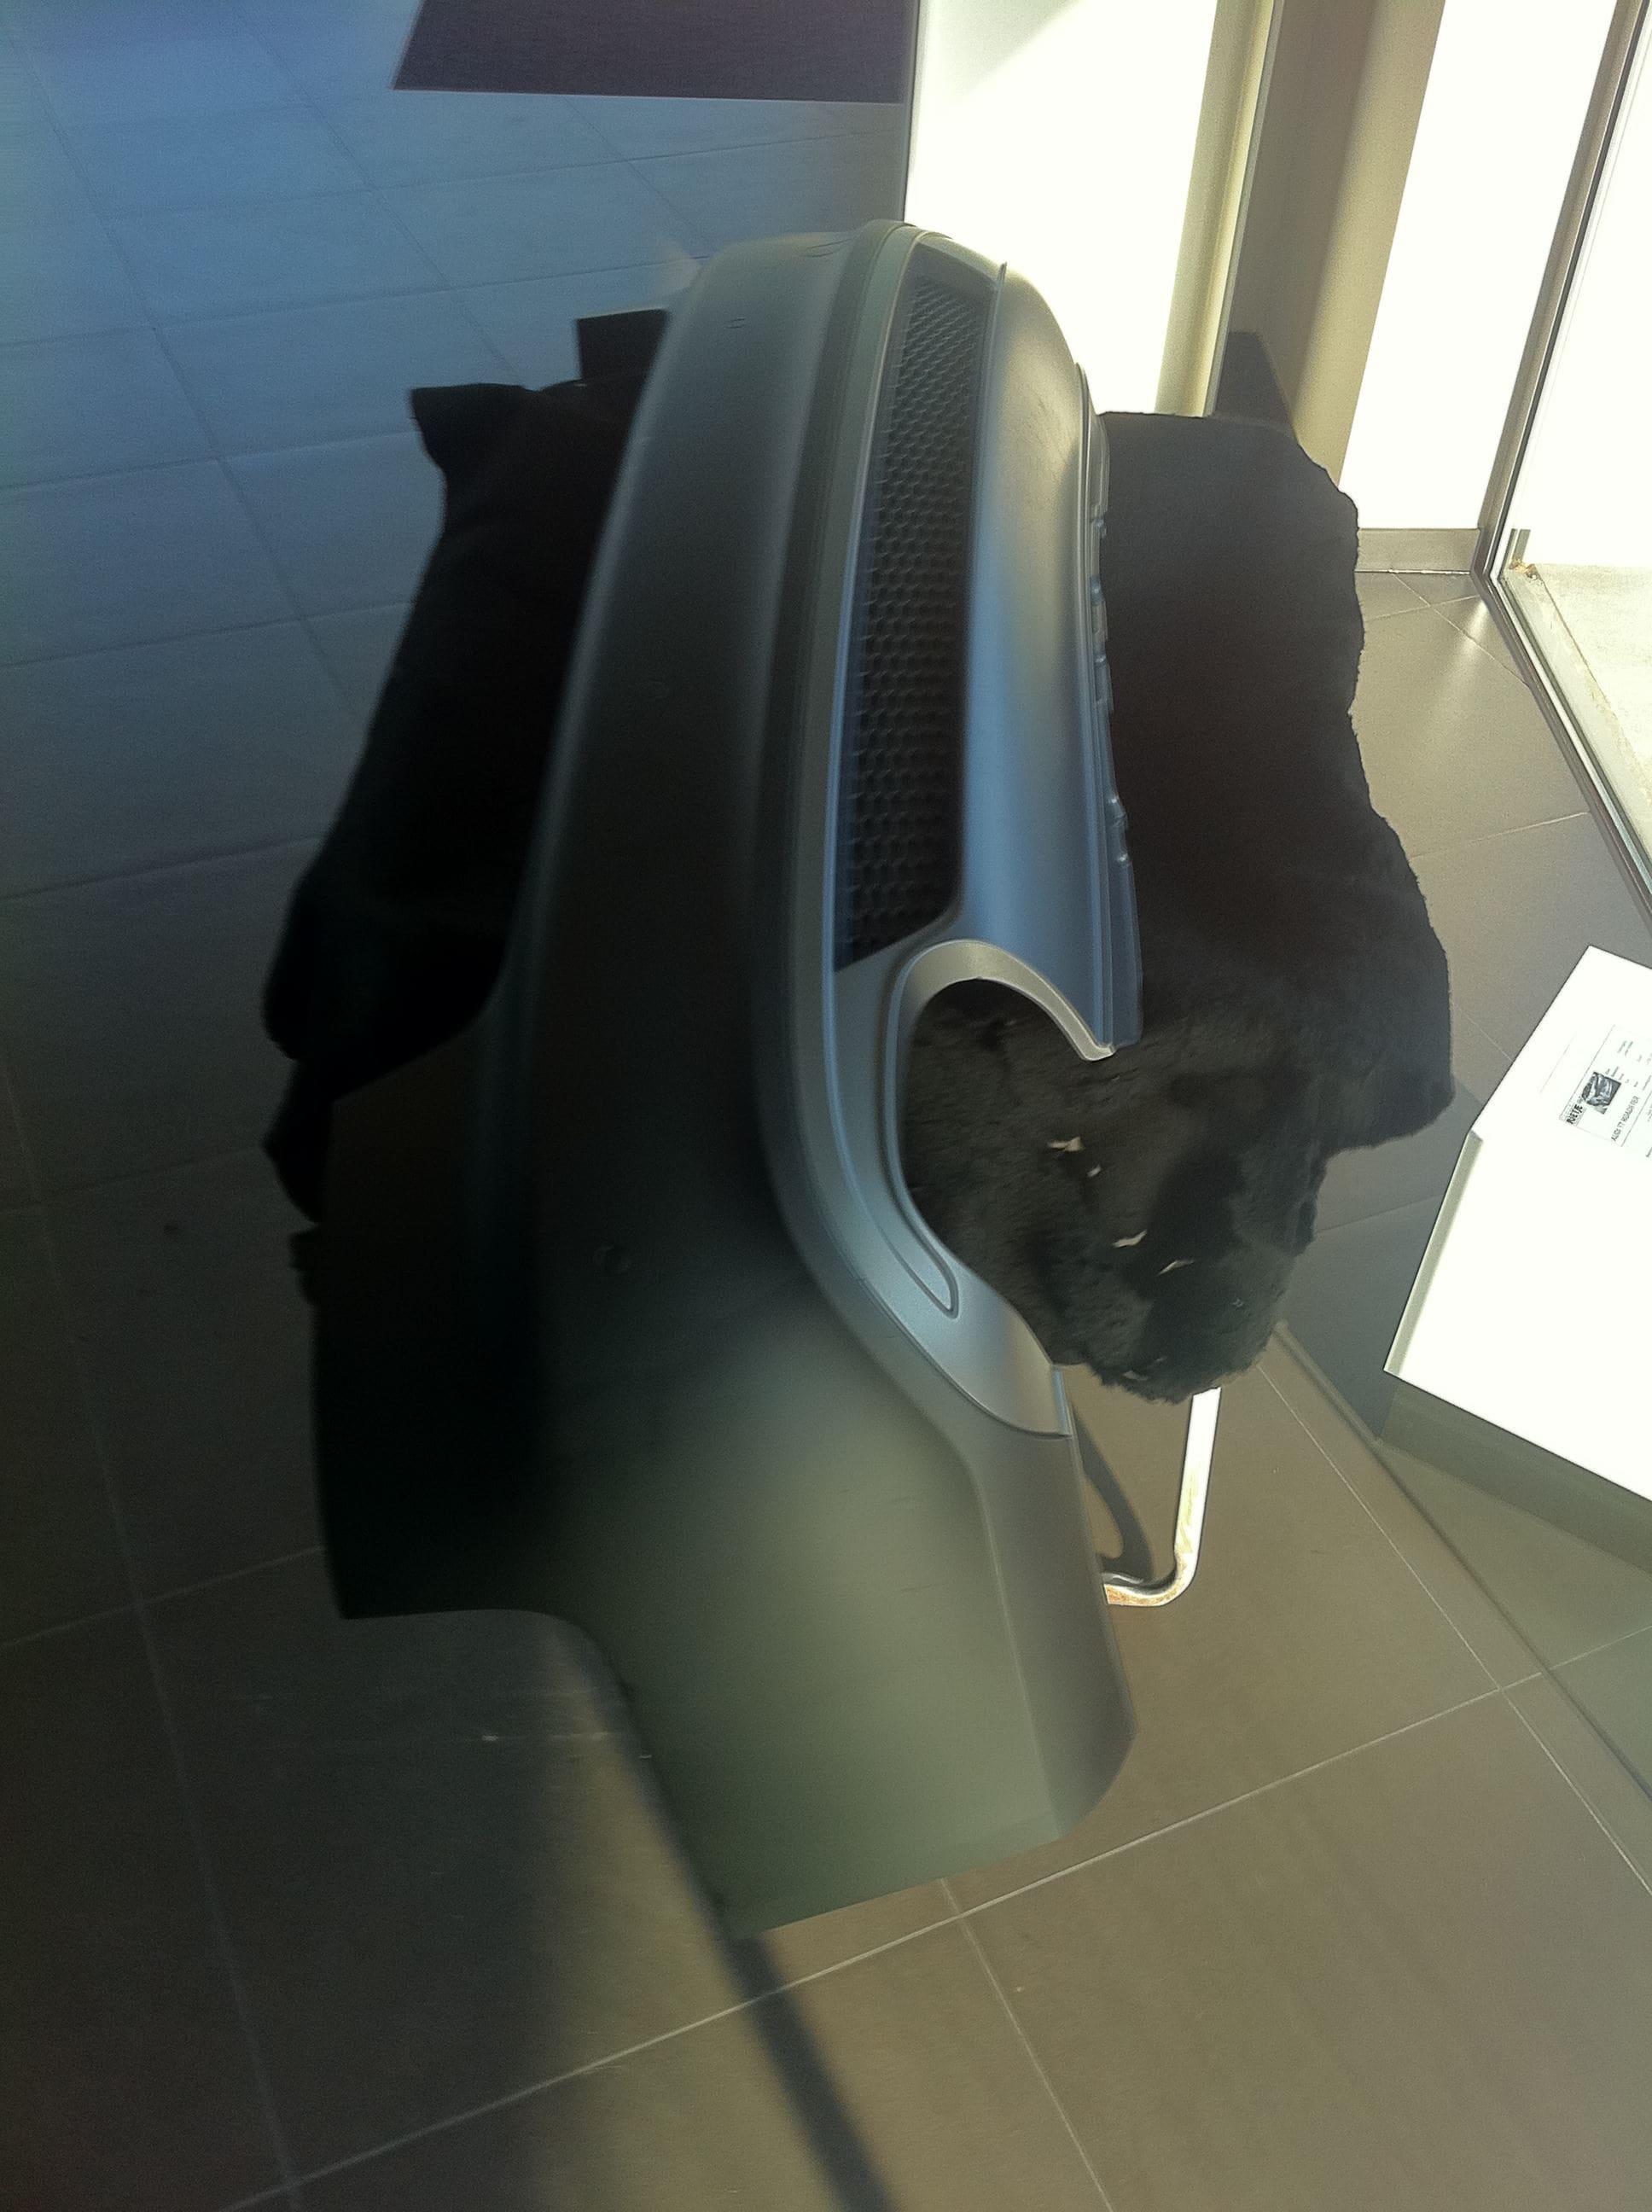 Audi A5 Coupe met Mat Zwarte Wrap, Carwrapping door Wrapmyride.nu Foto-nr:4579, ©2021